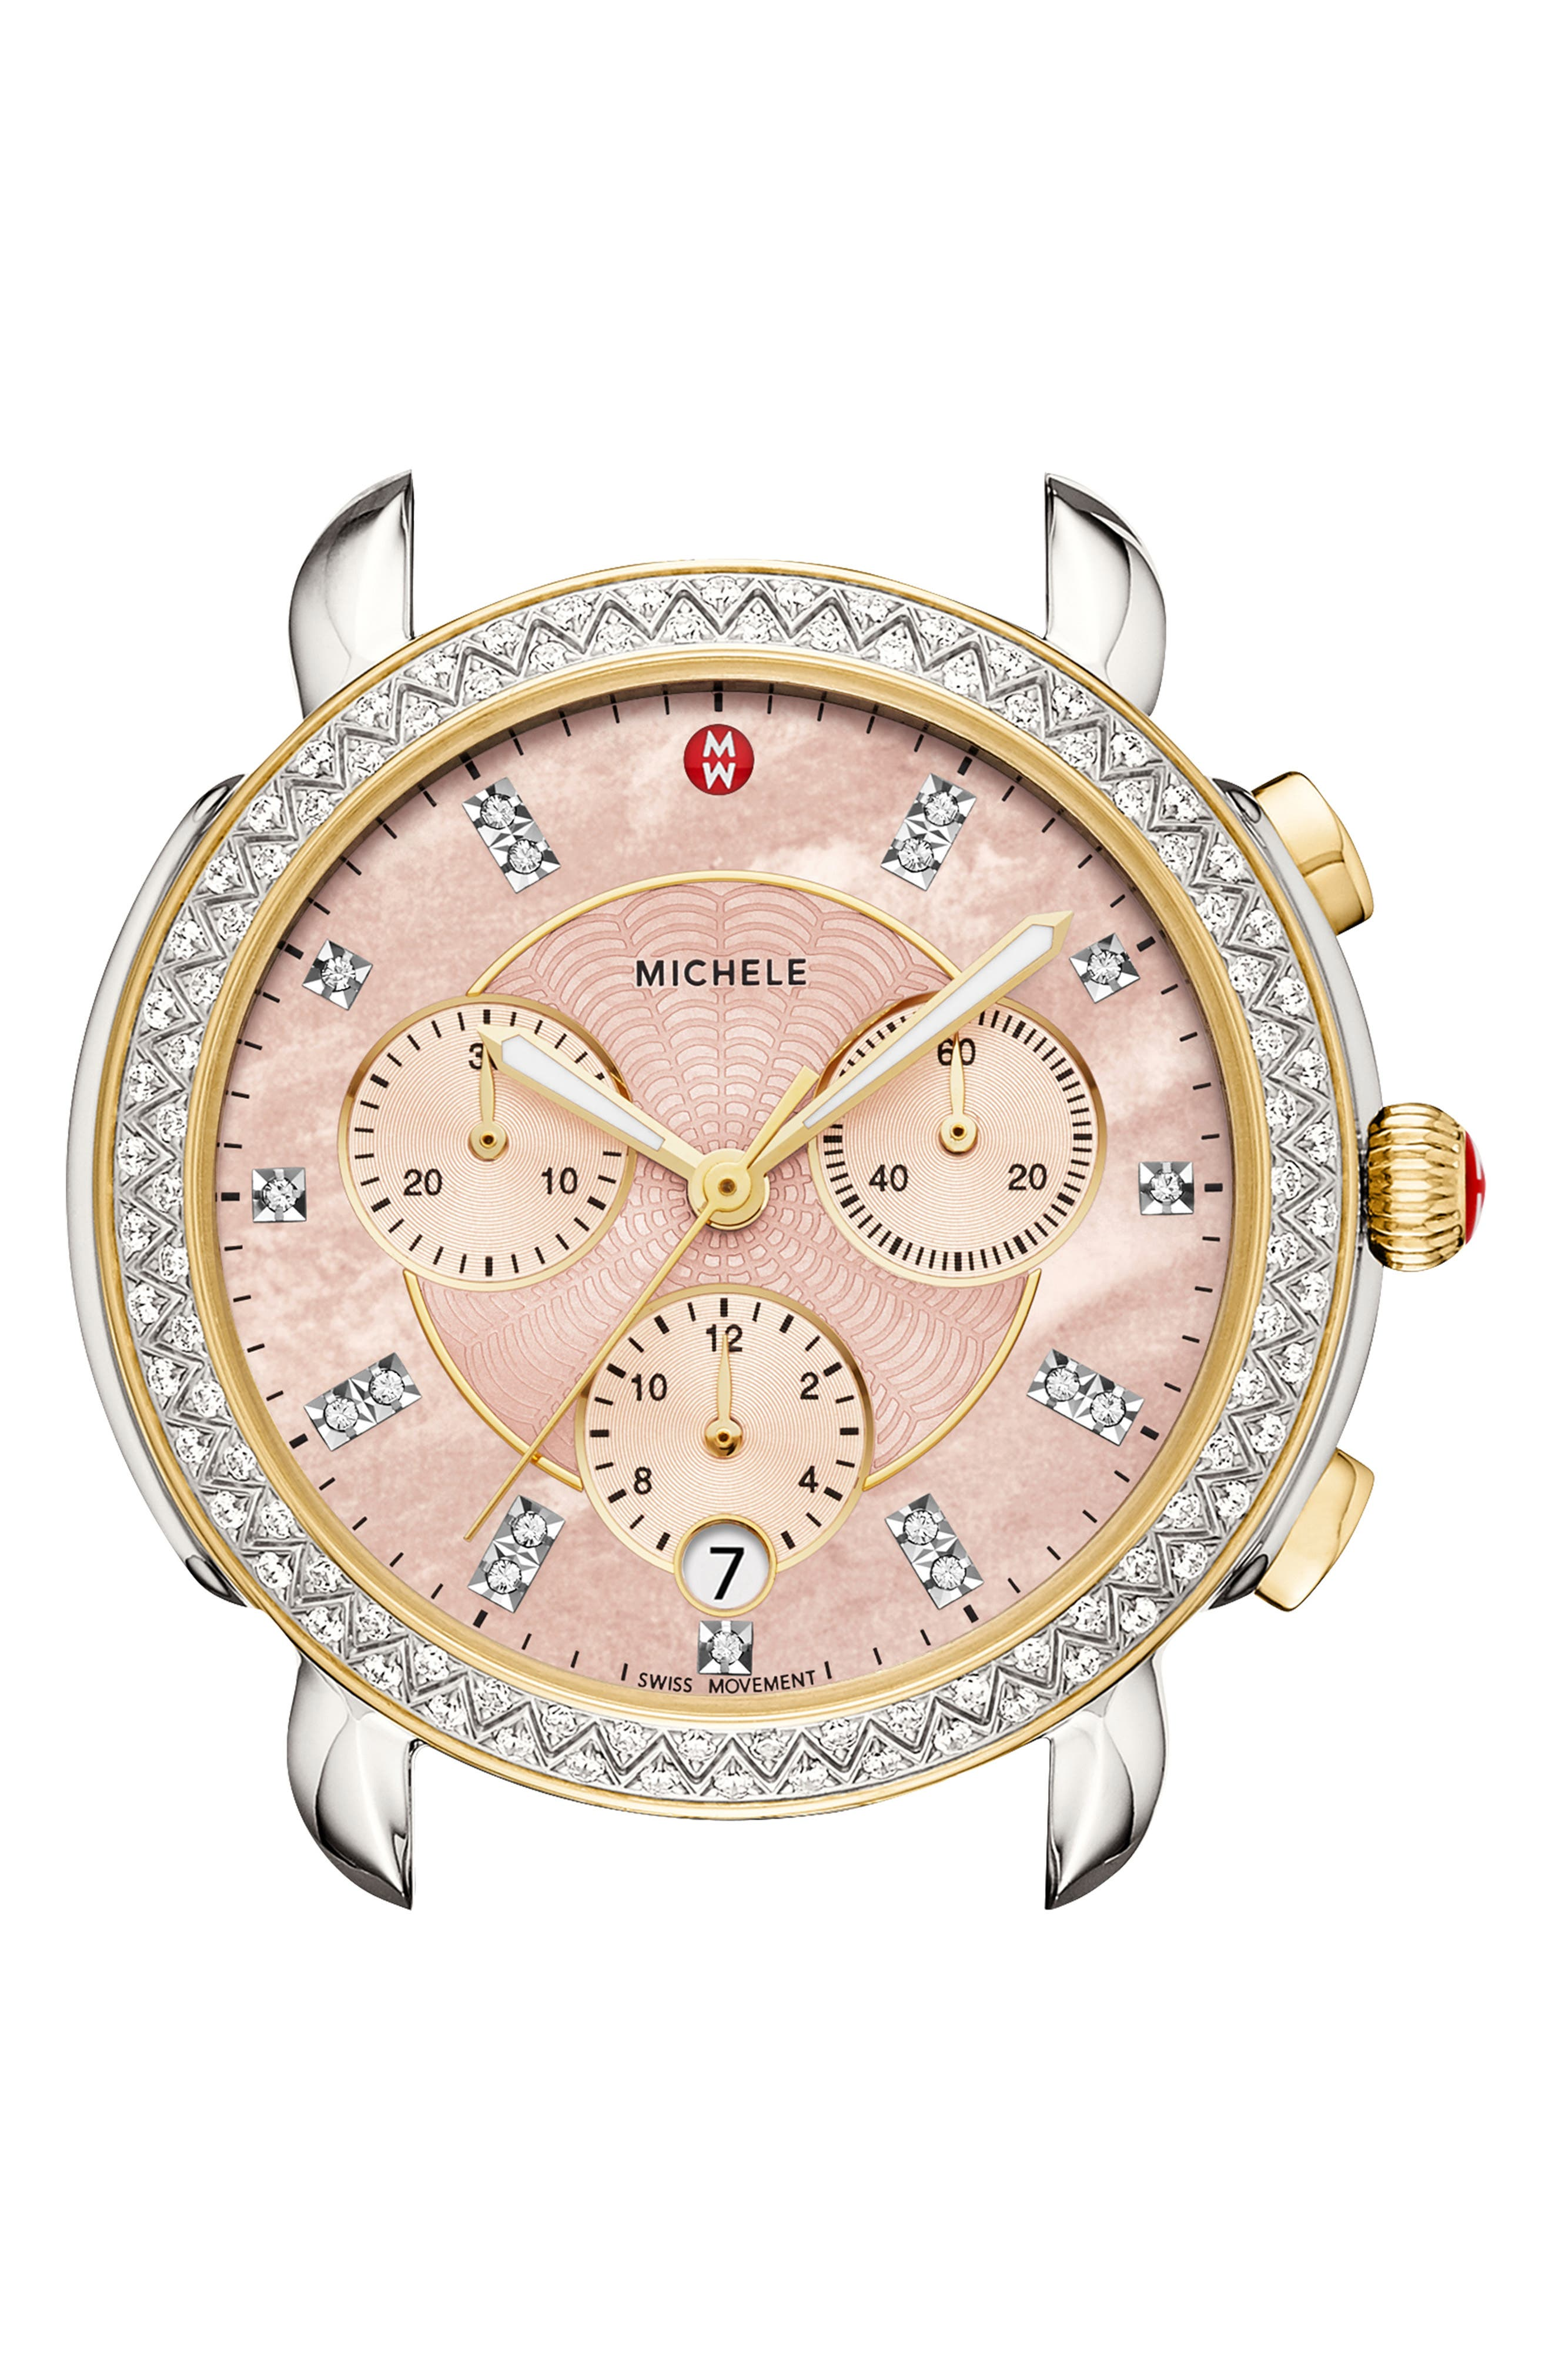 Sidney Chrono Diamond Diamond Dial Watch Case, 38mm, Main, color, GOLD/ SILVER/ DESERT ROSE MOP